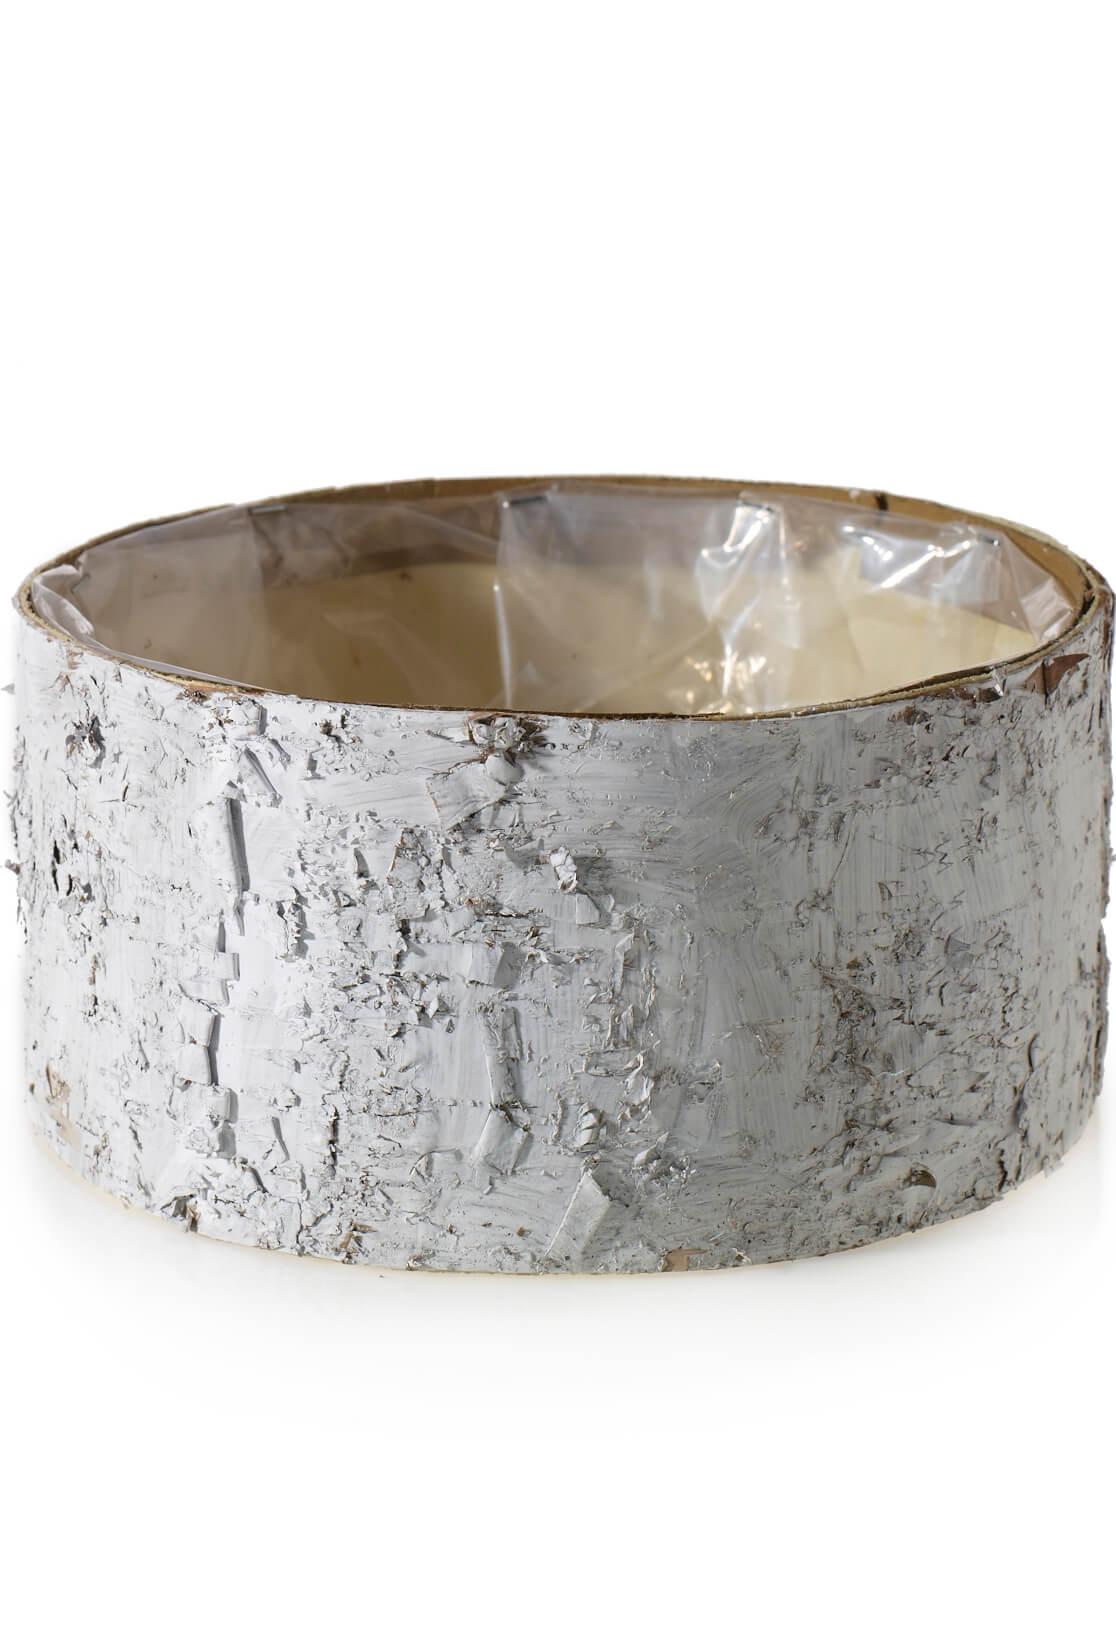 White Birch Bark Bowl Vase 10x4 7